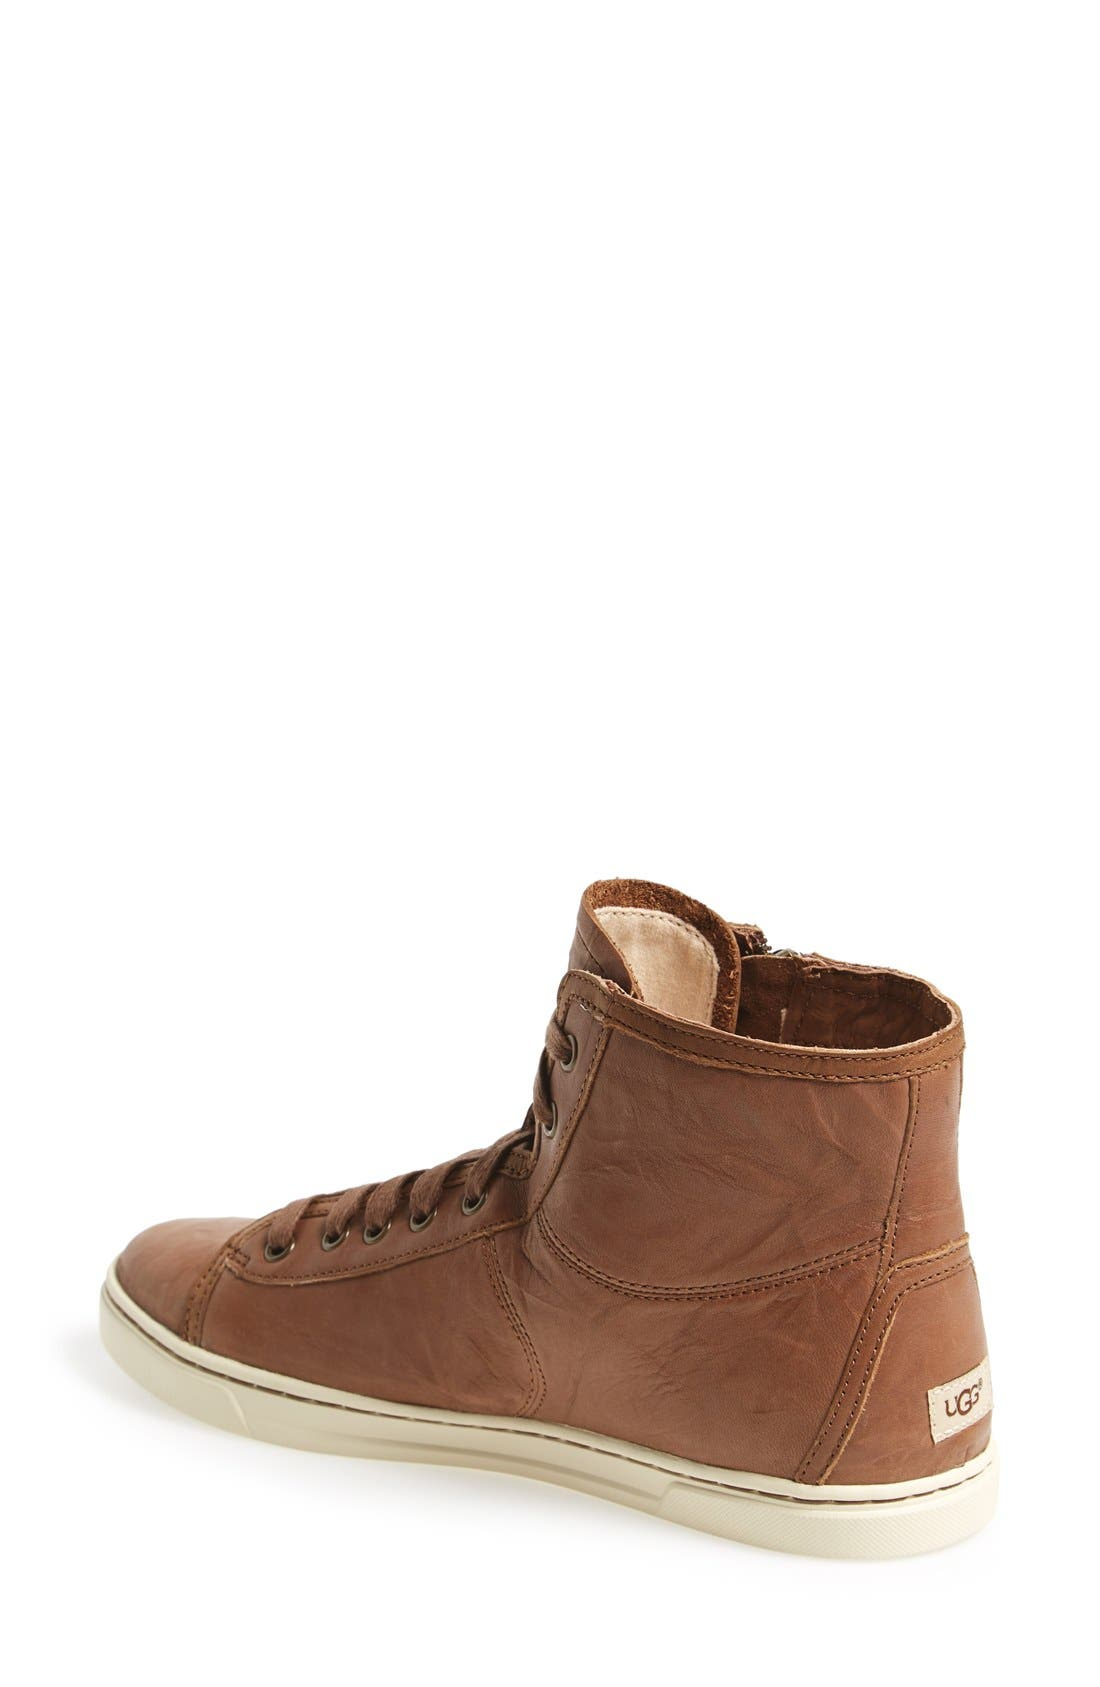 Alternate Image 2  - UGG® 'Blaney' Tasseled High Top Sneaker (Women)